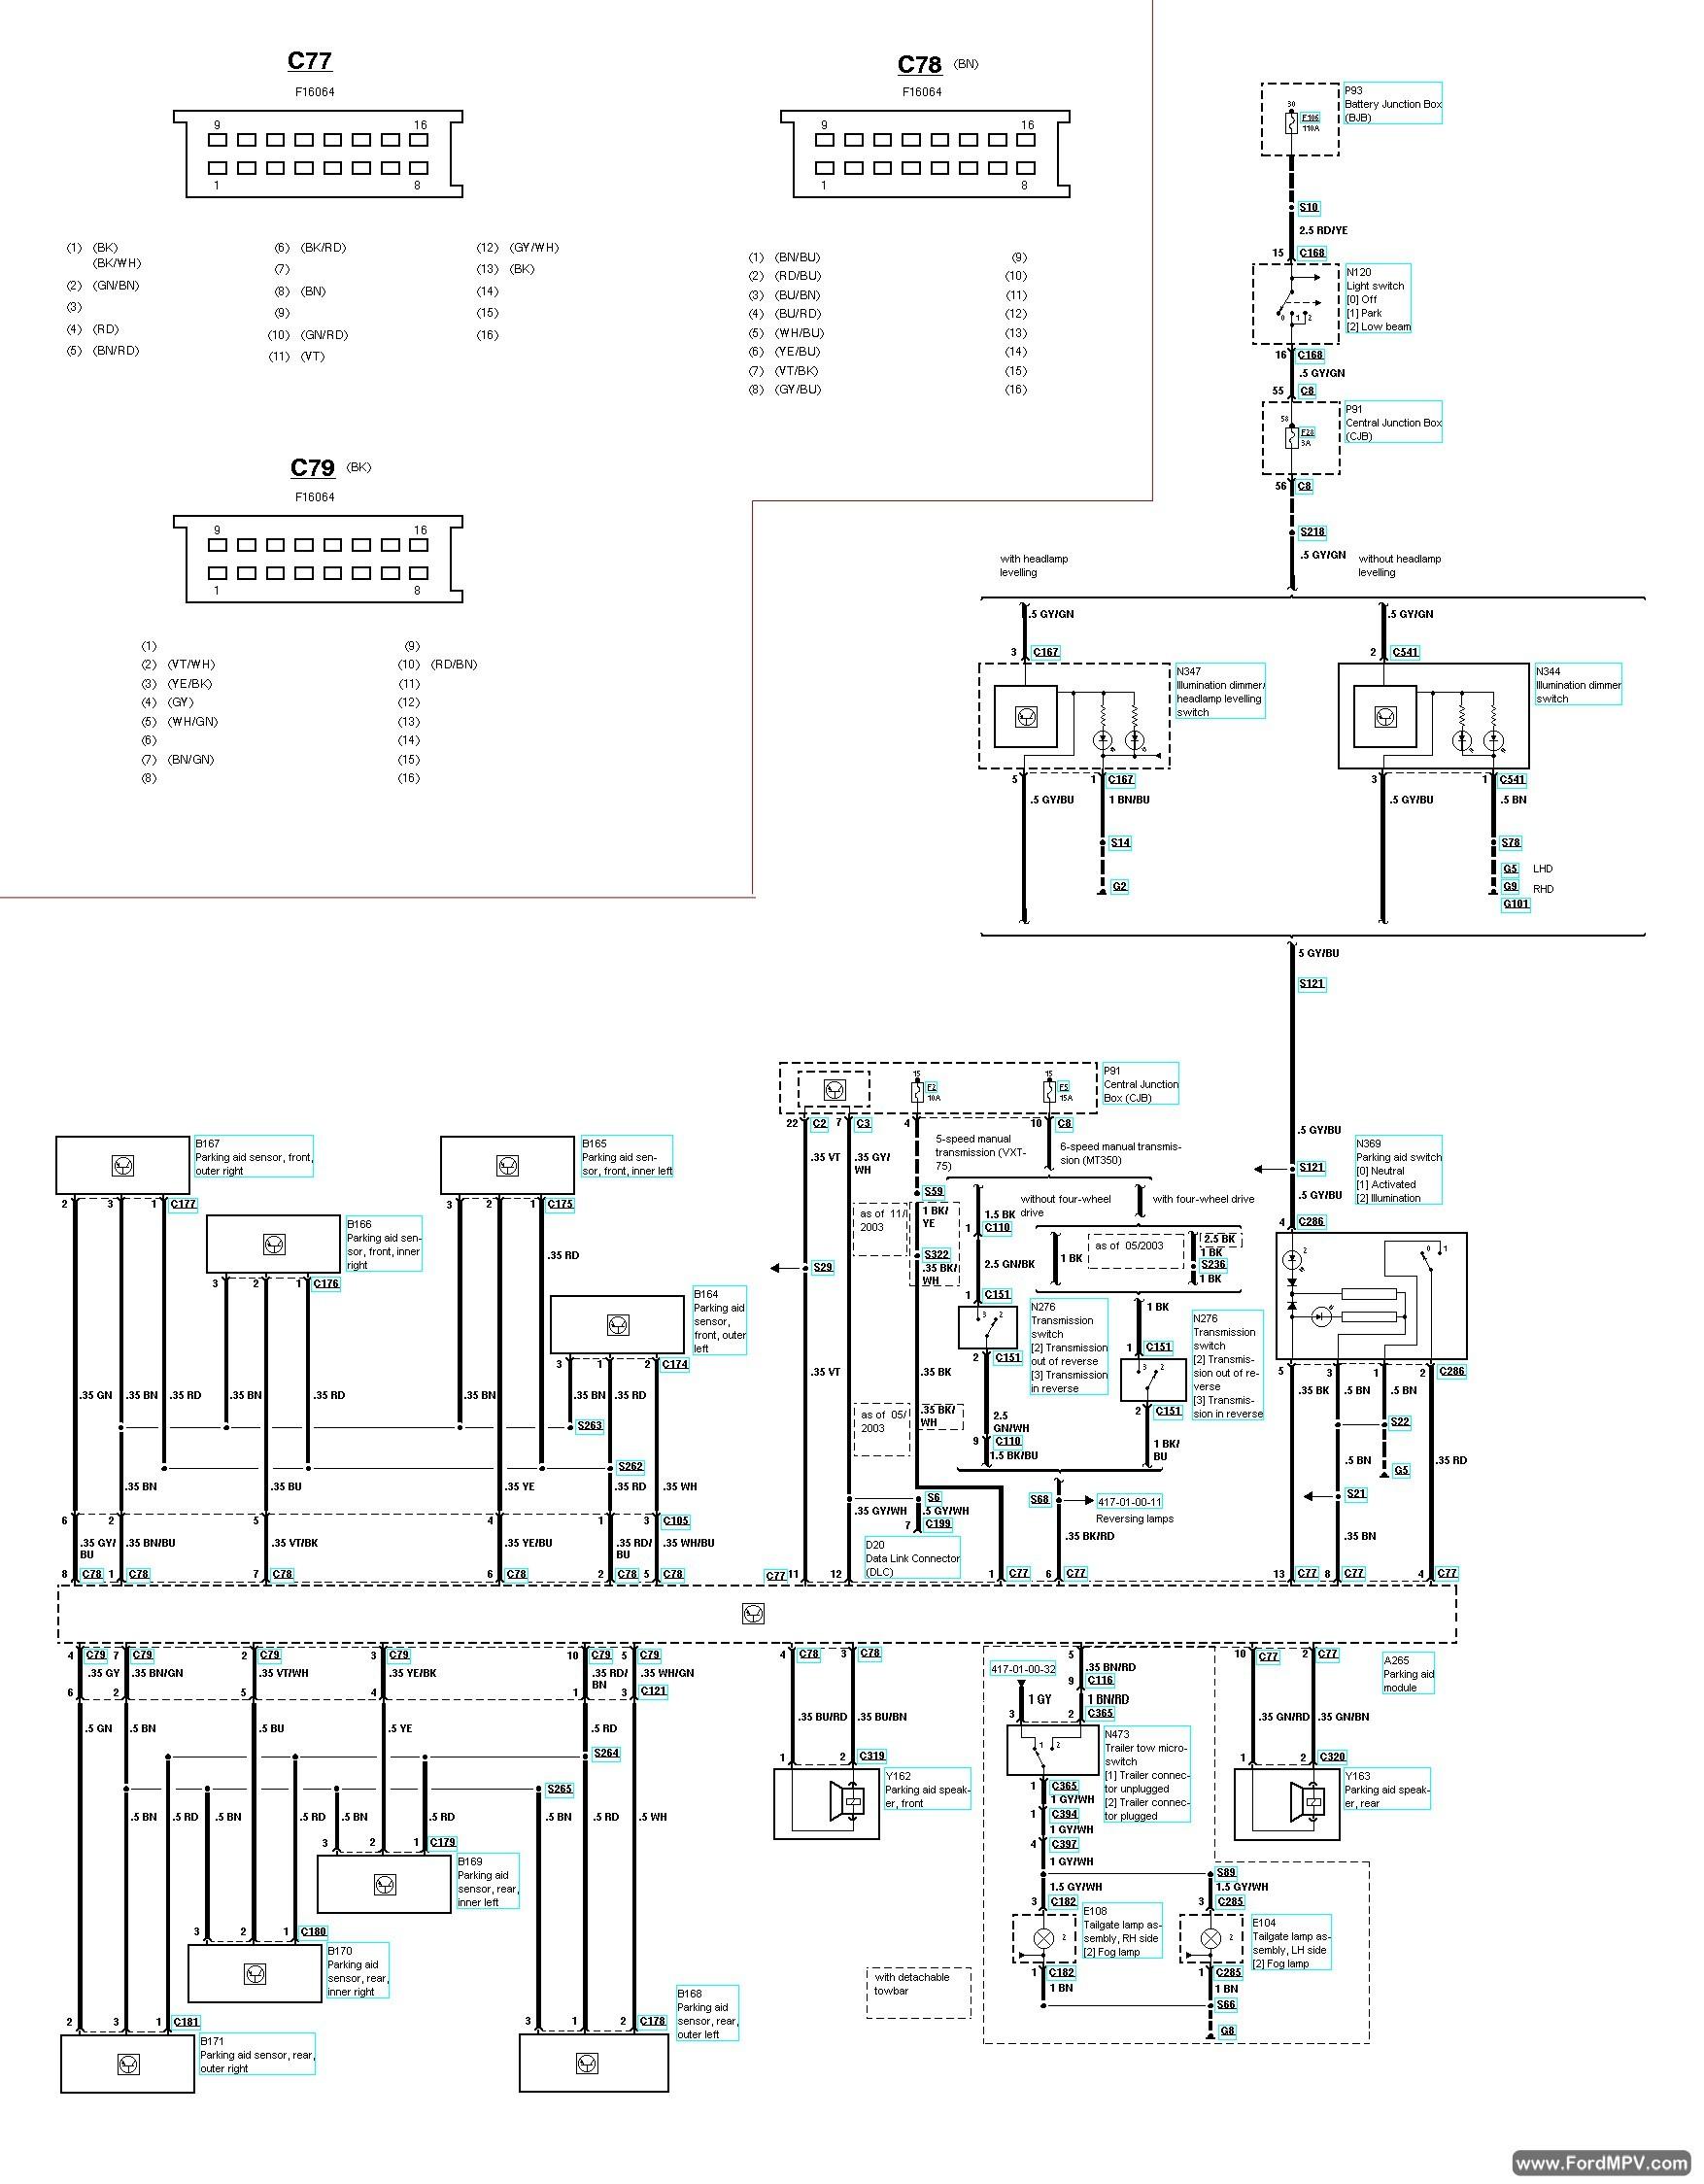 Electrical Engineering Wiring Diagram Unique Light Wiring Diagram Diagram Of Electrical Engineering Wiring Diagram